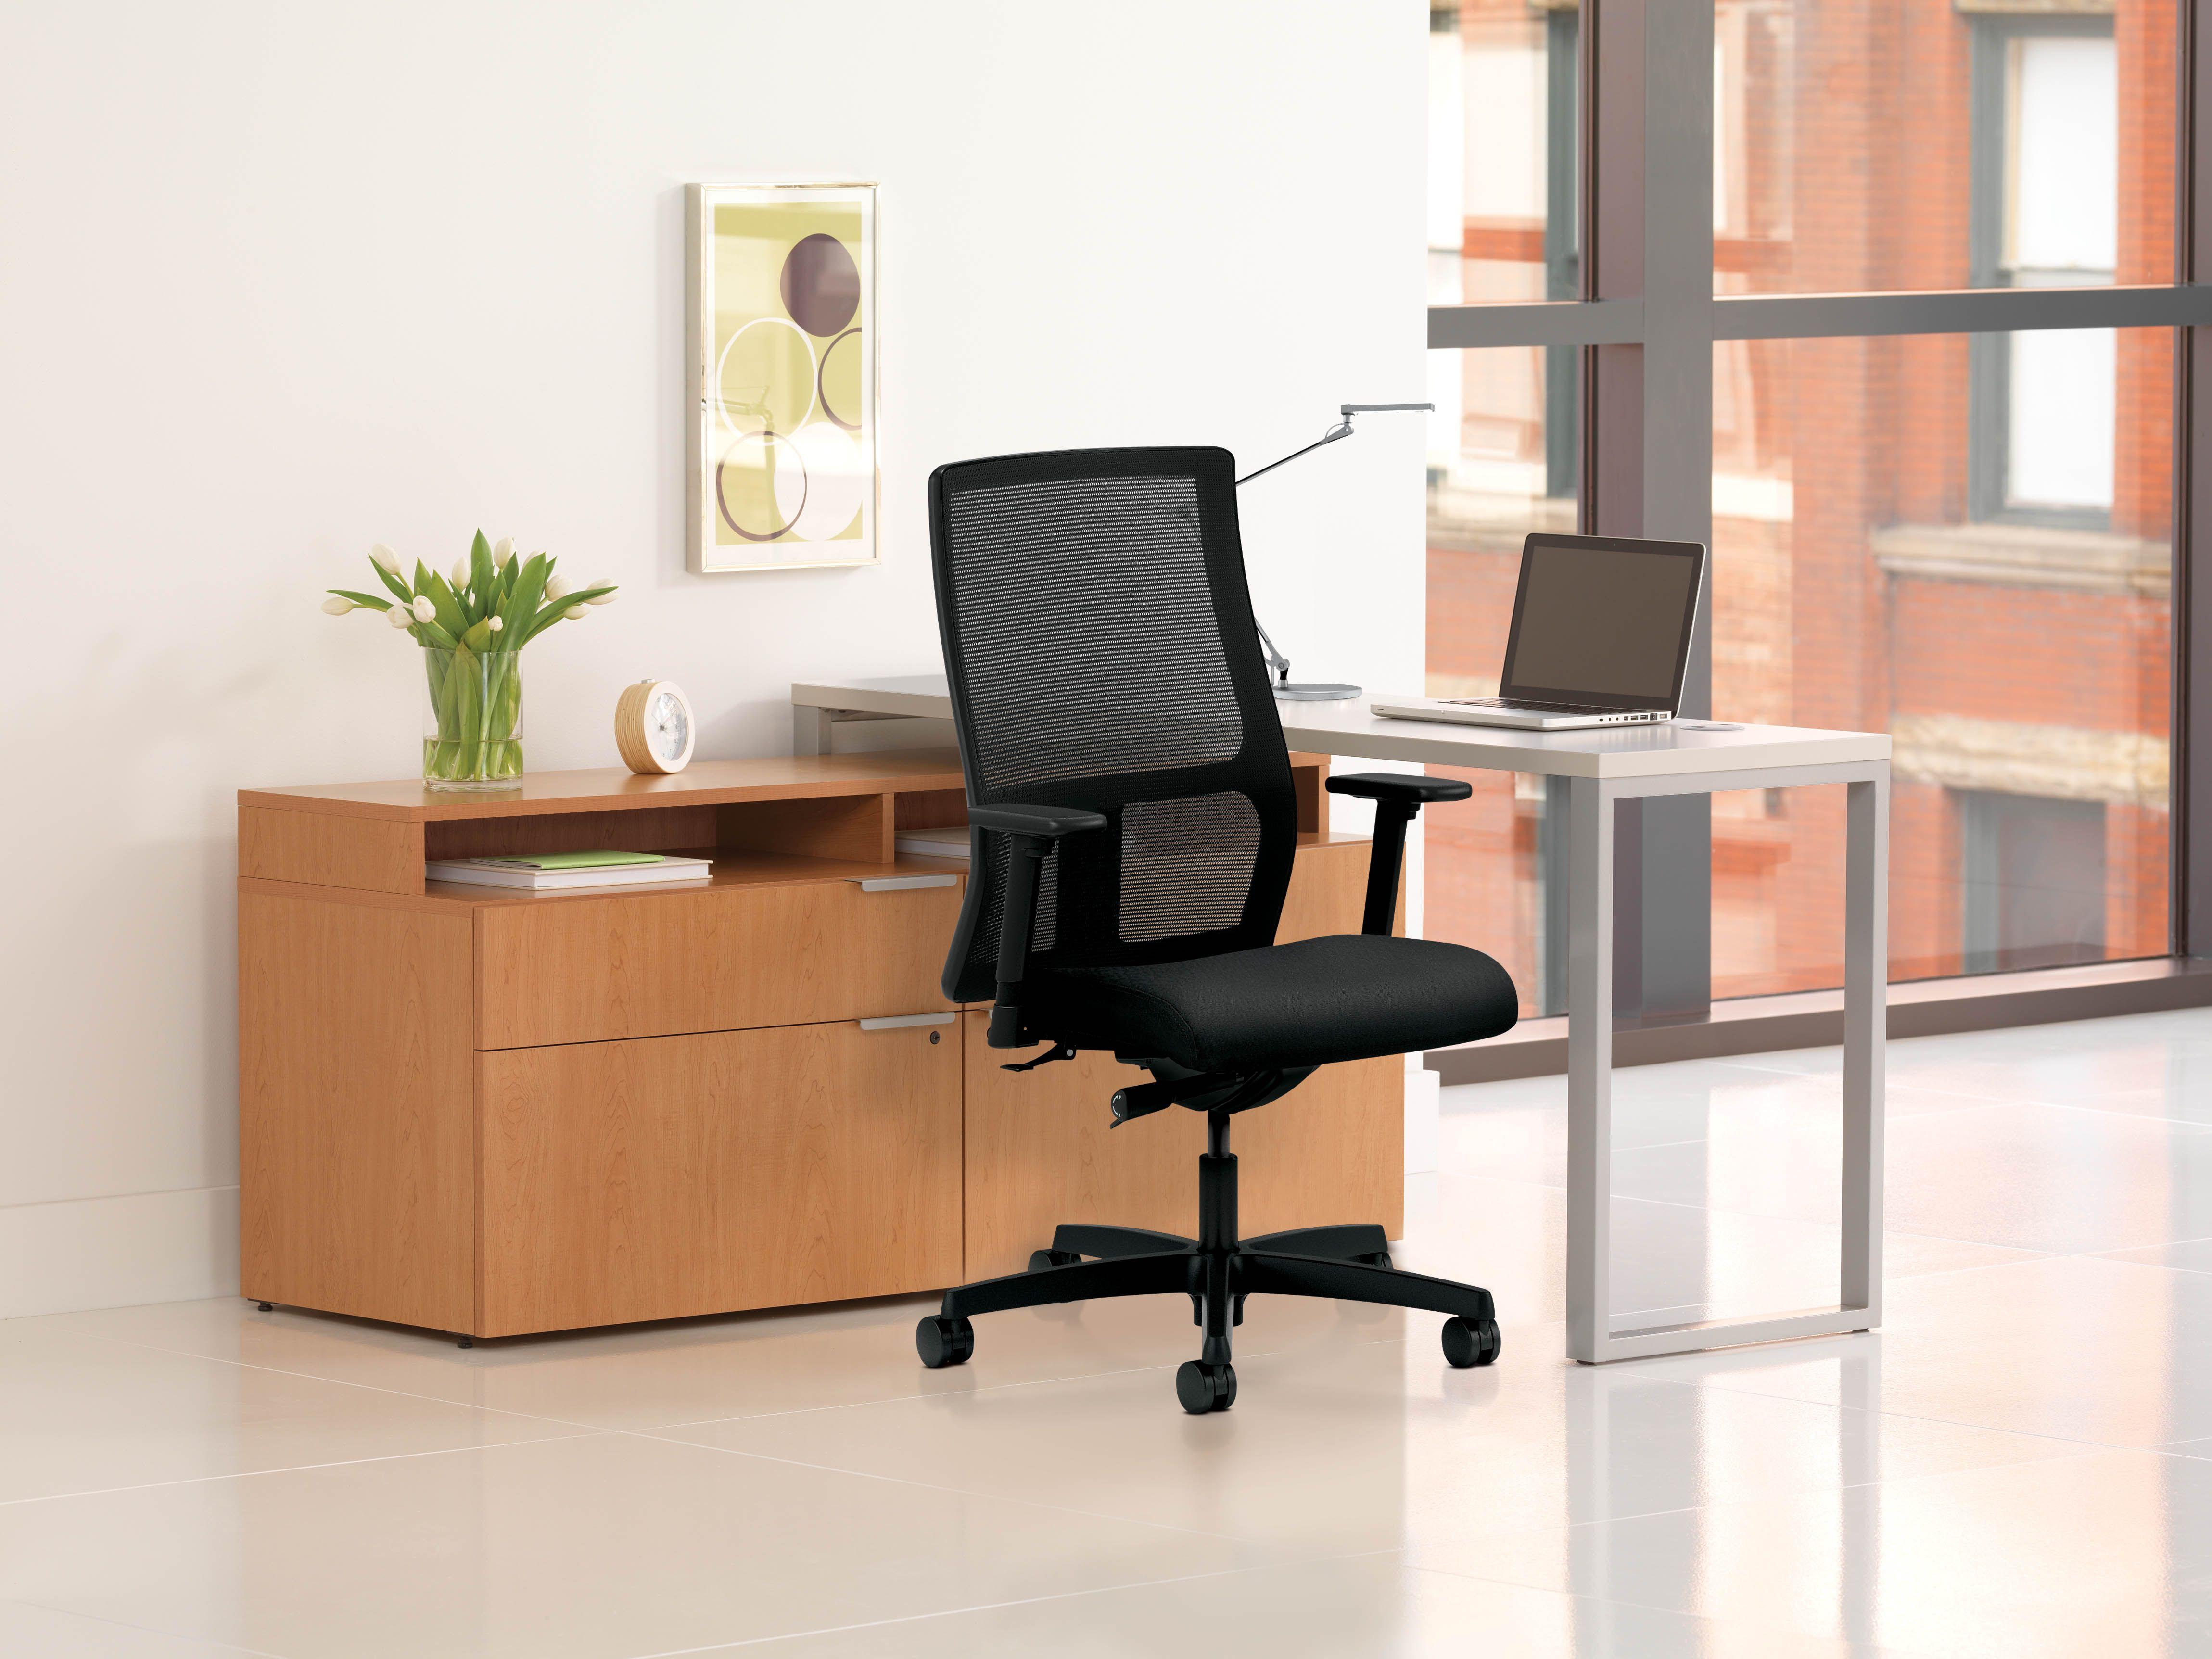 surprising idea hon office furniture hon voi forward when planning orjpg 45983449 300 series pinterest aesthetic hon office chairs